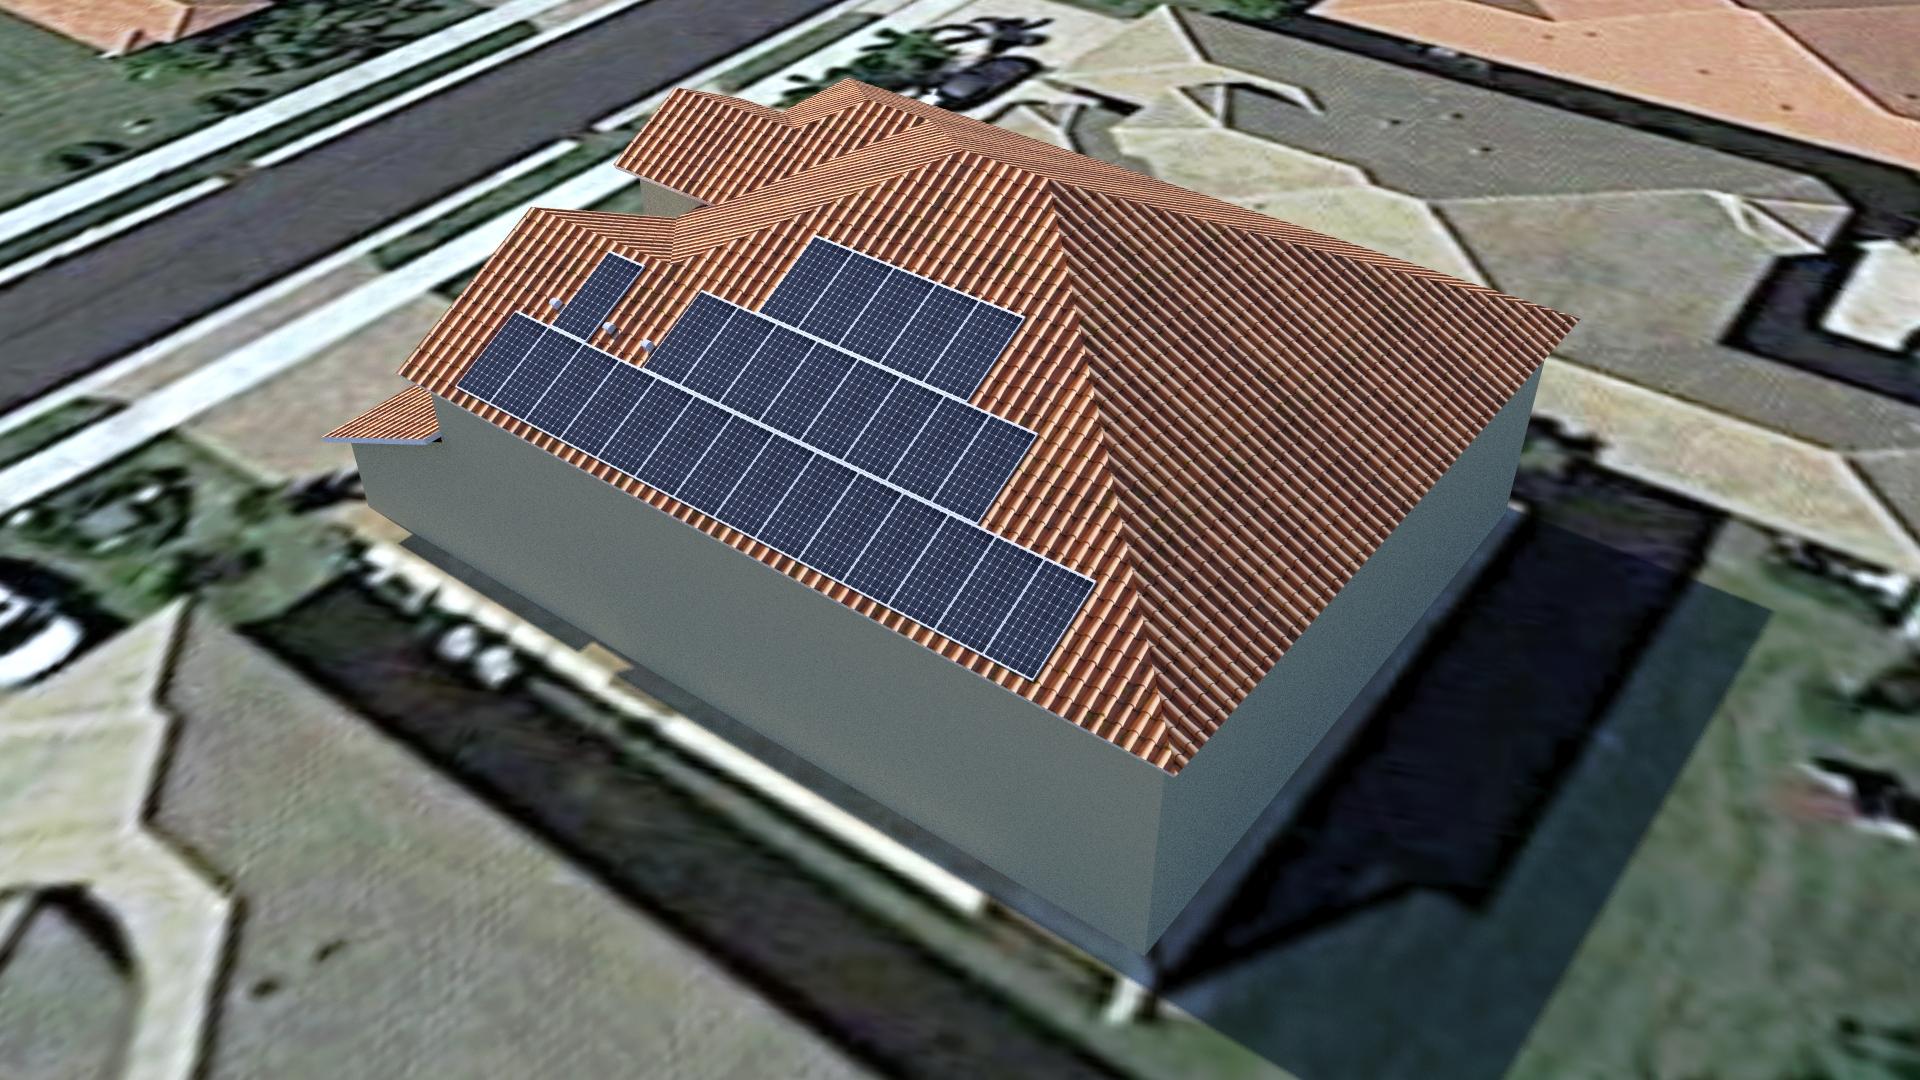 Solar panel design layout 00001 florida solar design group for Solar panel blueprint